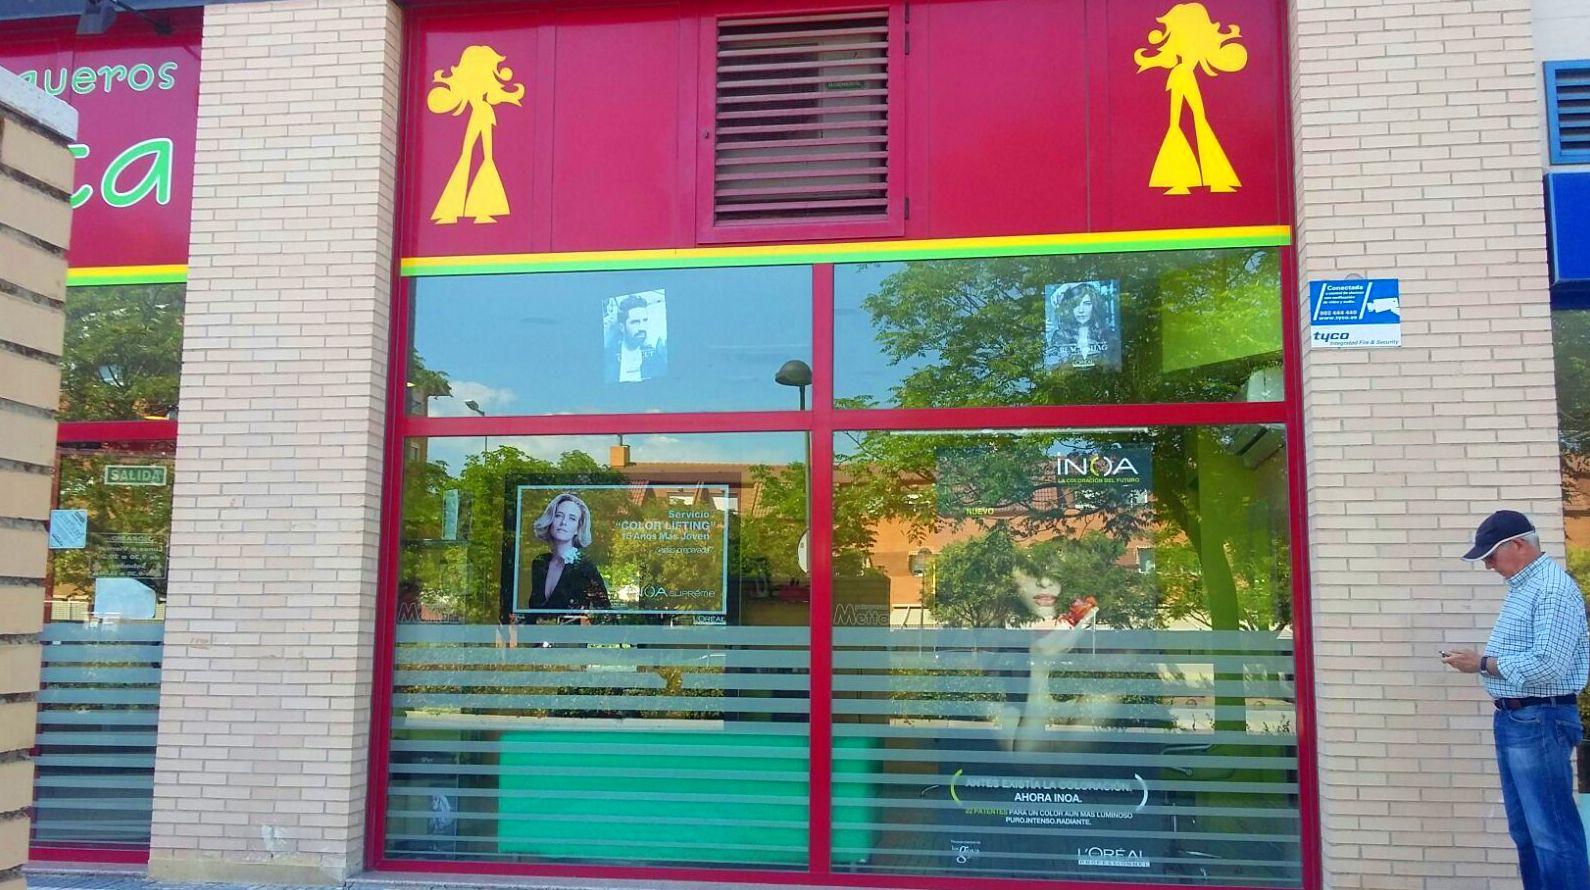 Peluquerías unisex en Alcalá de Henares